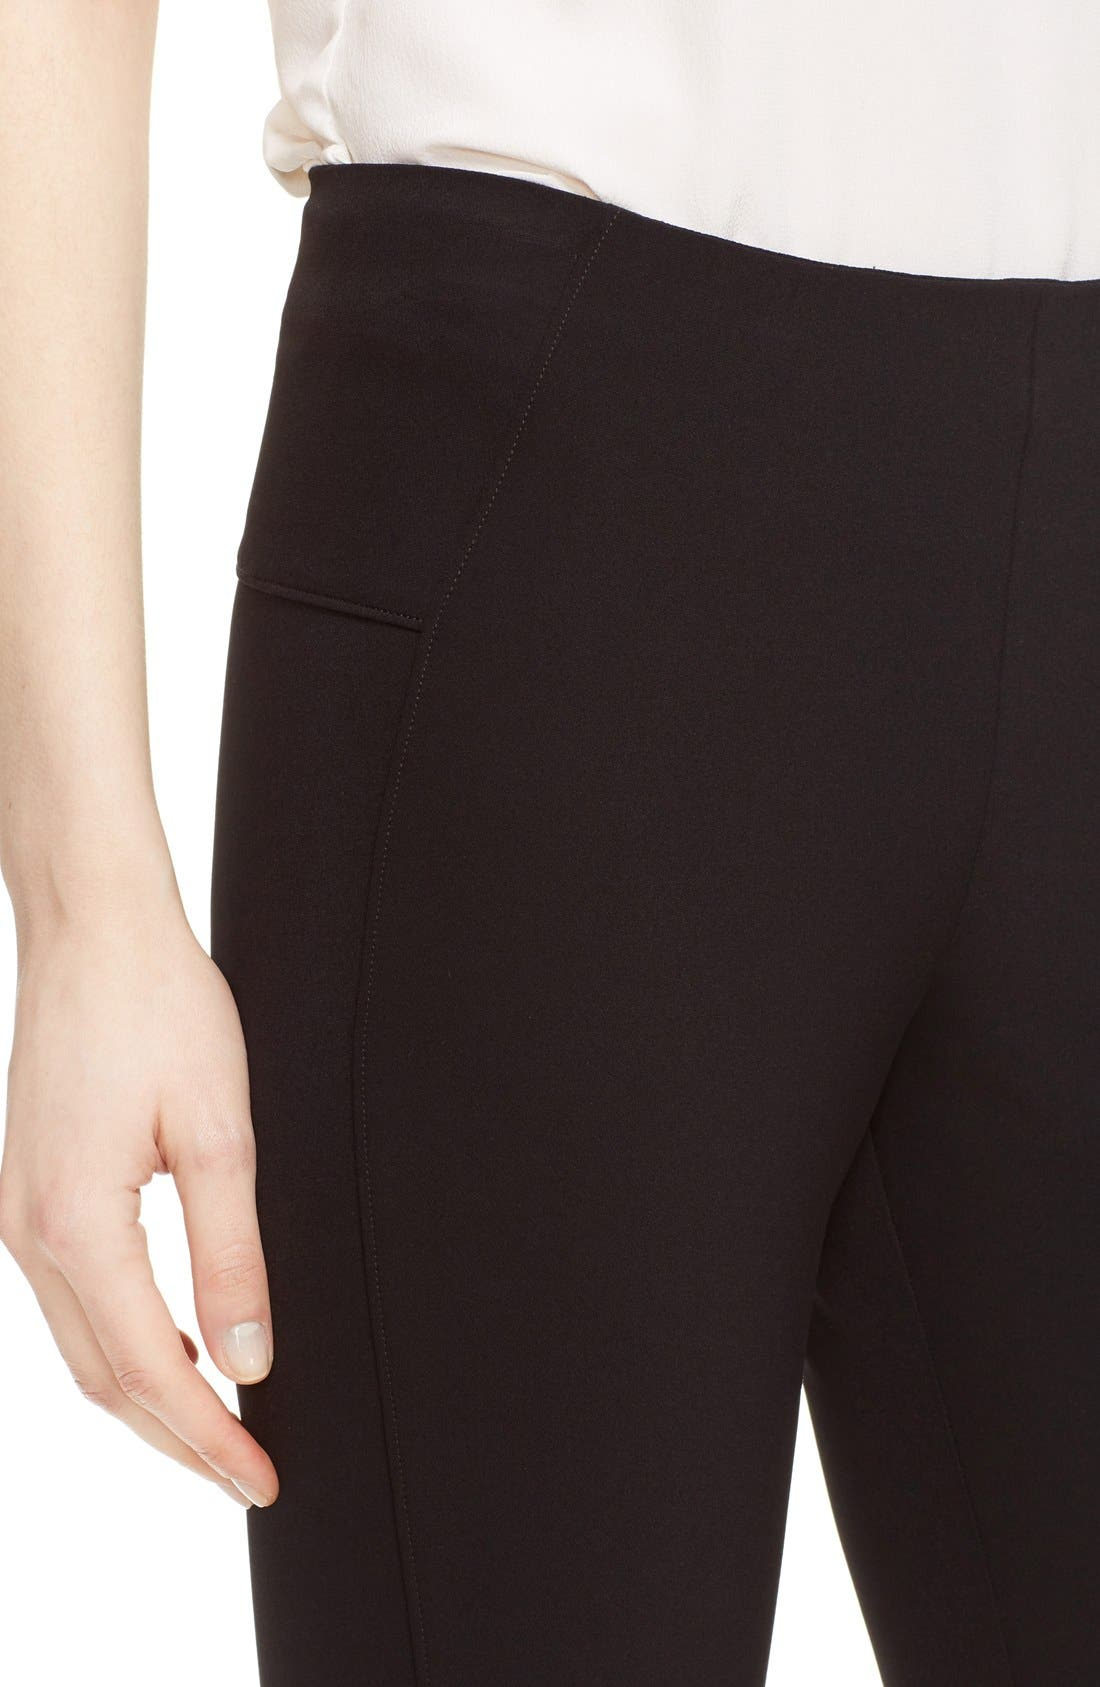 Scuba Pants,                             Alternate thumbnail 7, color,                             BLACK